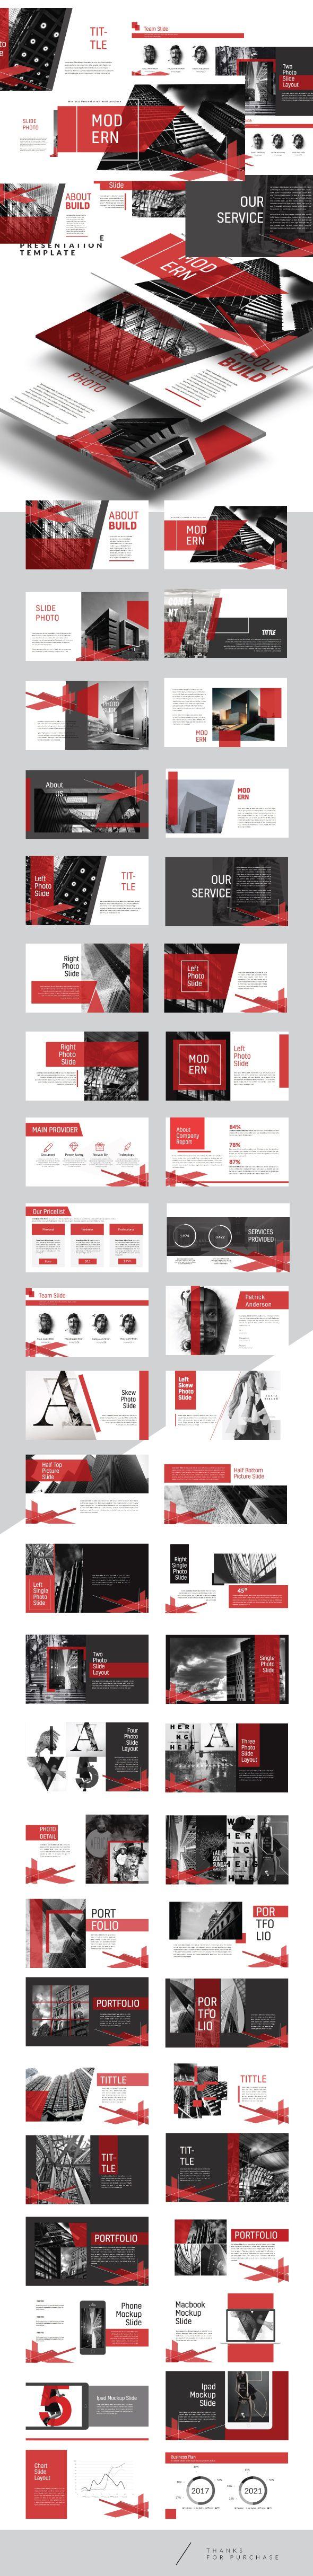 Arch - Creative Multipurpose Keynote Template